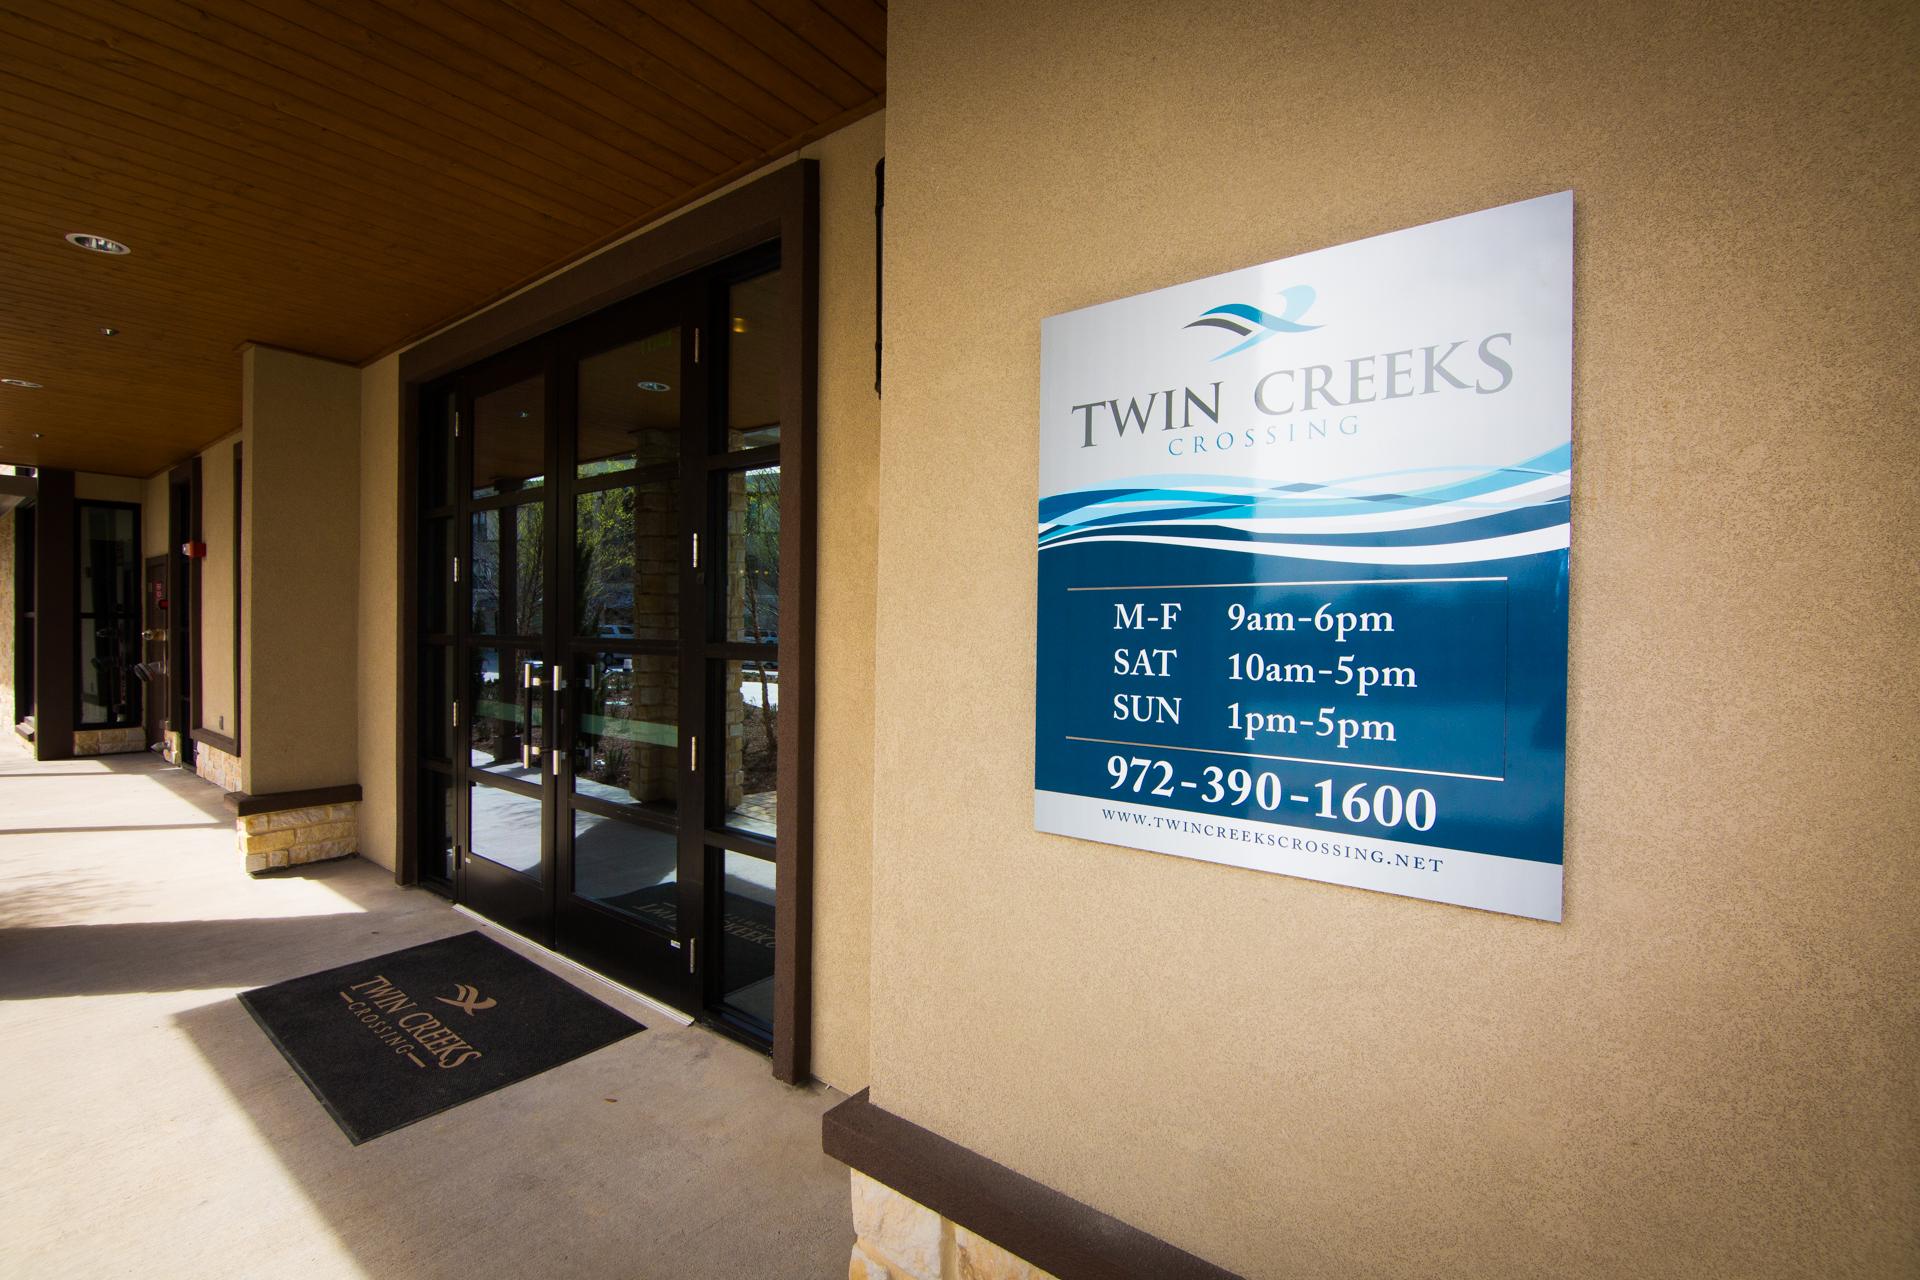 2015-03-26-Twin Creeks Apartments web-7.jpg